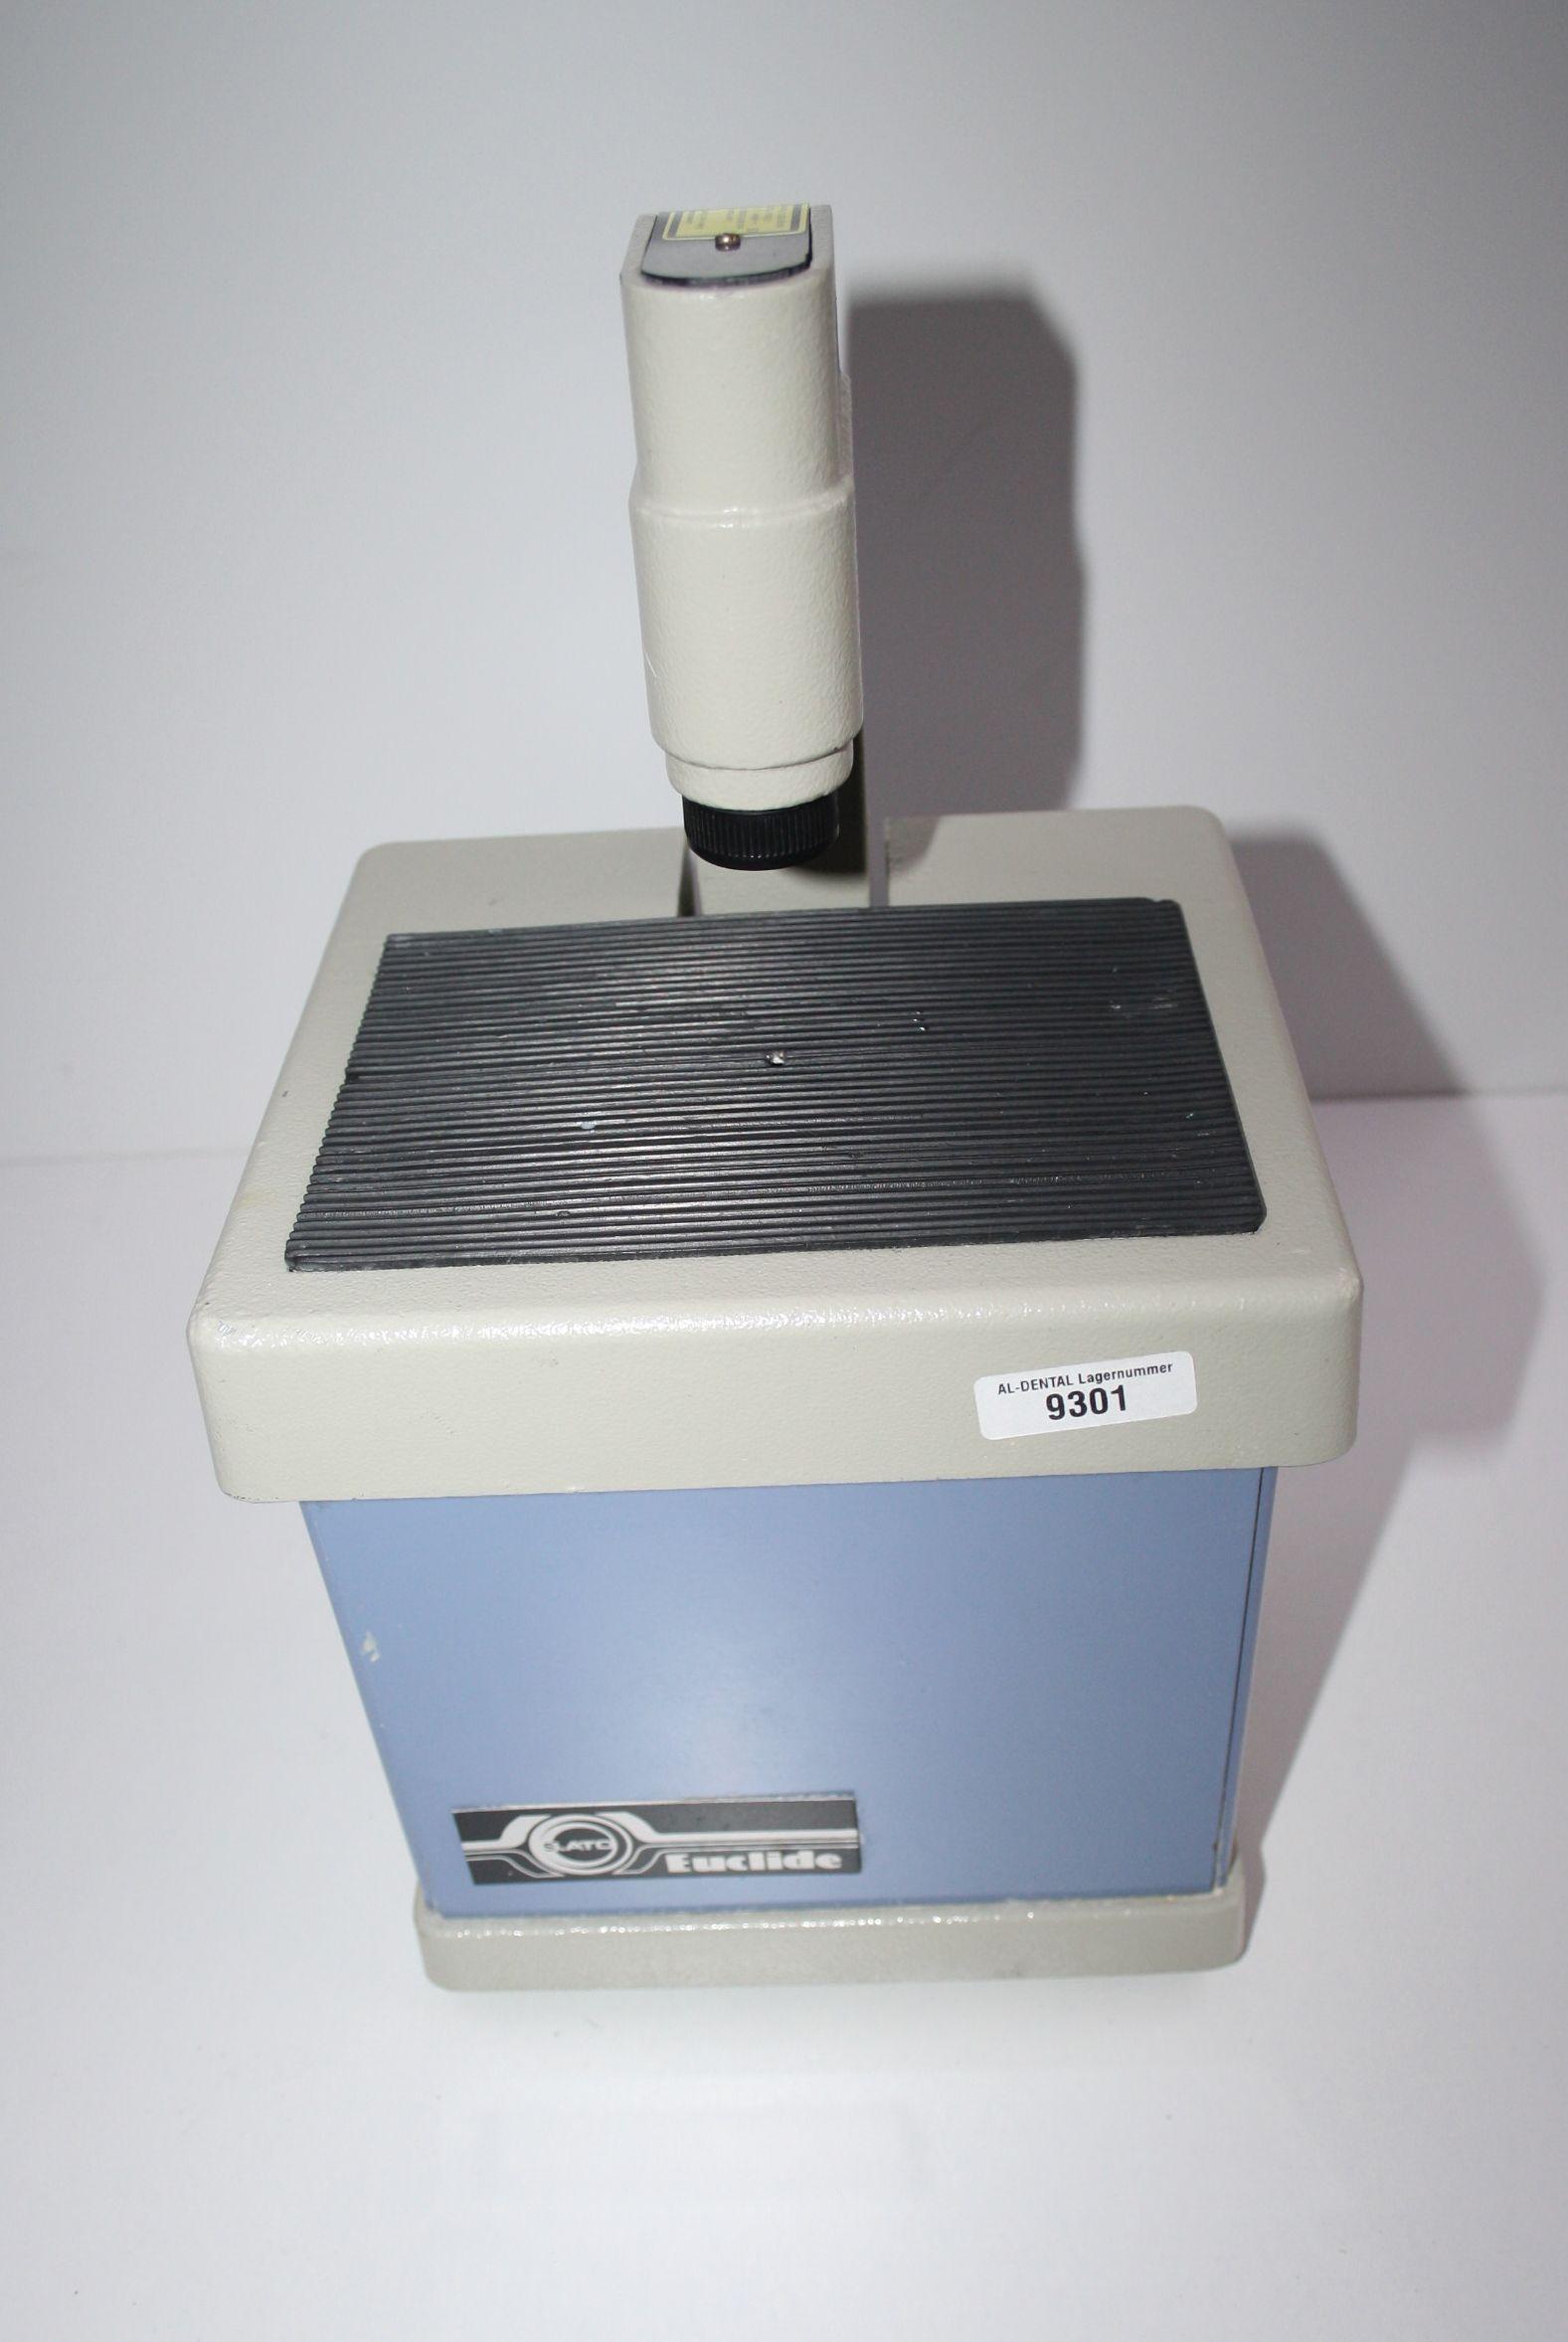 SATO Euclide Pindex  Laserpinbohrgerät # 9301